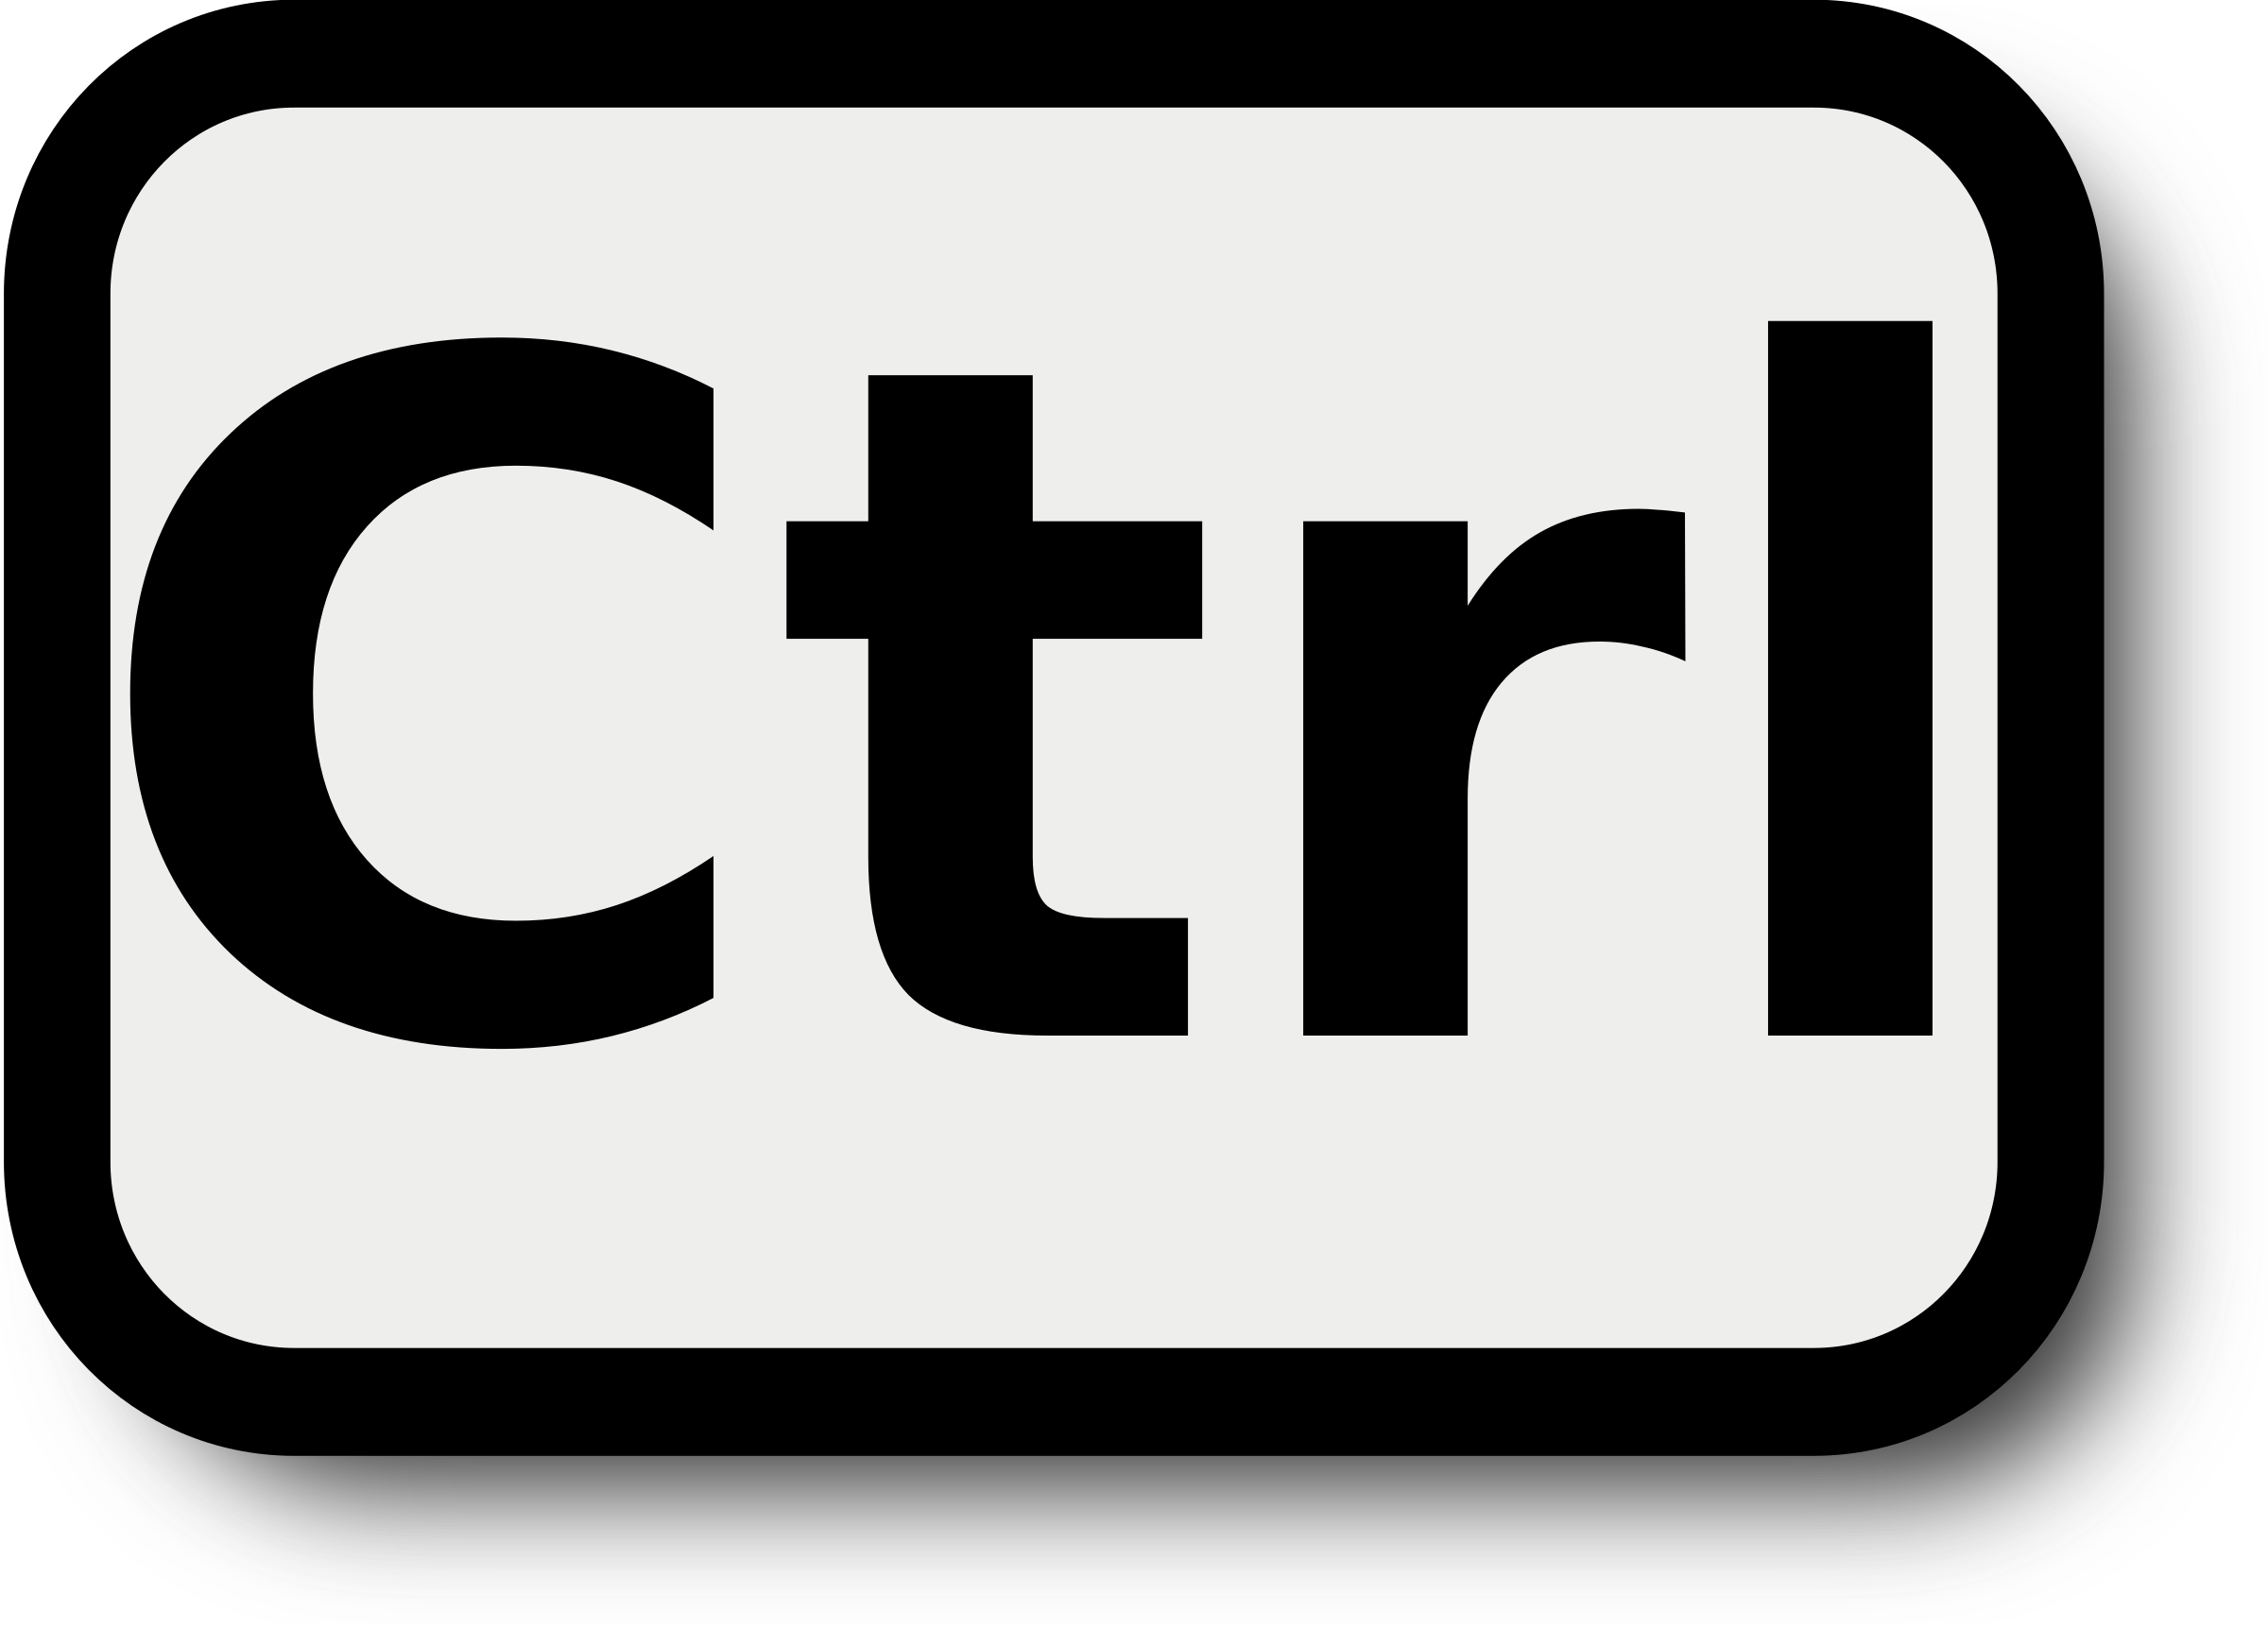 ctrl key - Ctrl Key PNG